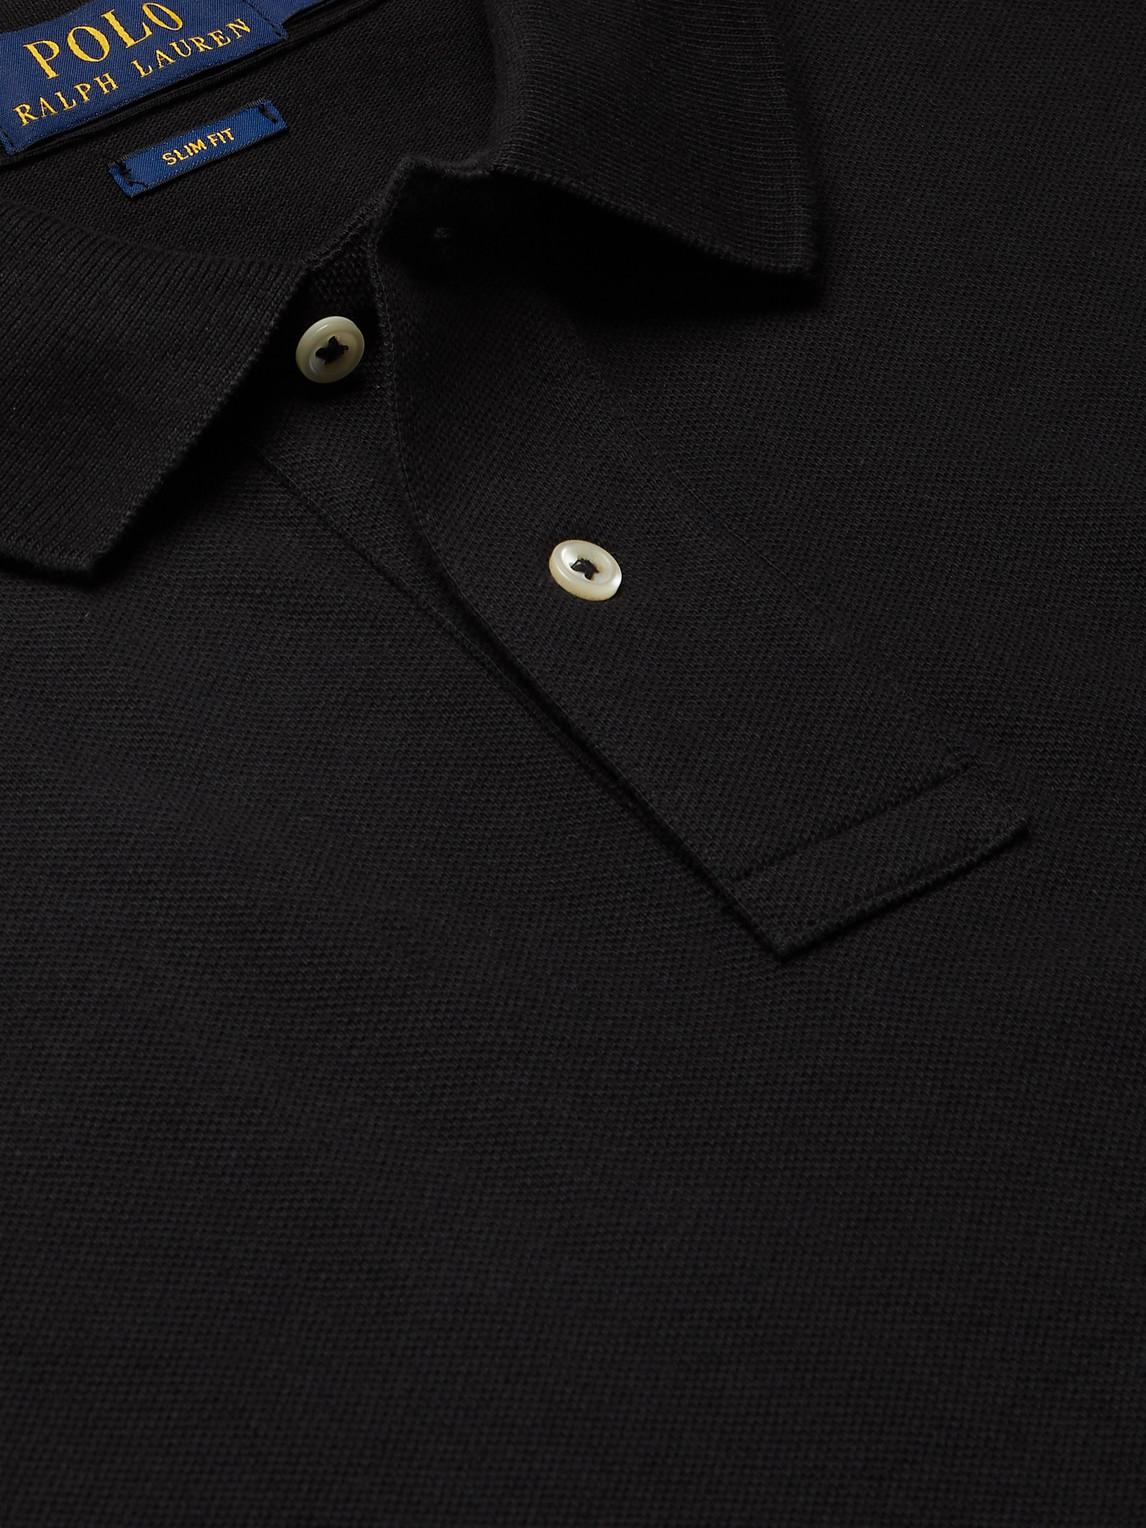 POLO RALPH LAUREN Cottons SLIM-FIT LOGO-EMBROIDERED COTTON-PIQUE POLO SHIRT